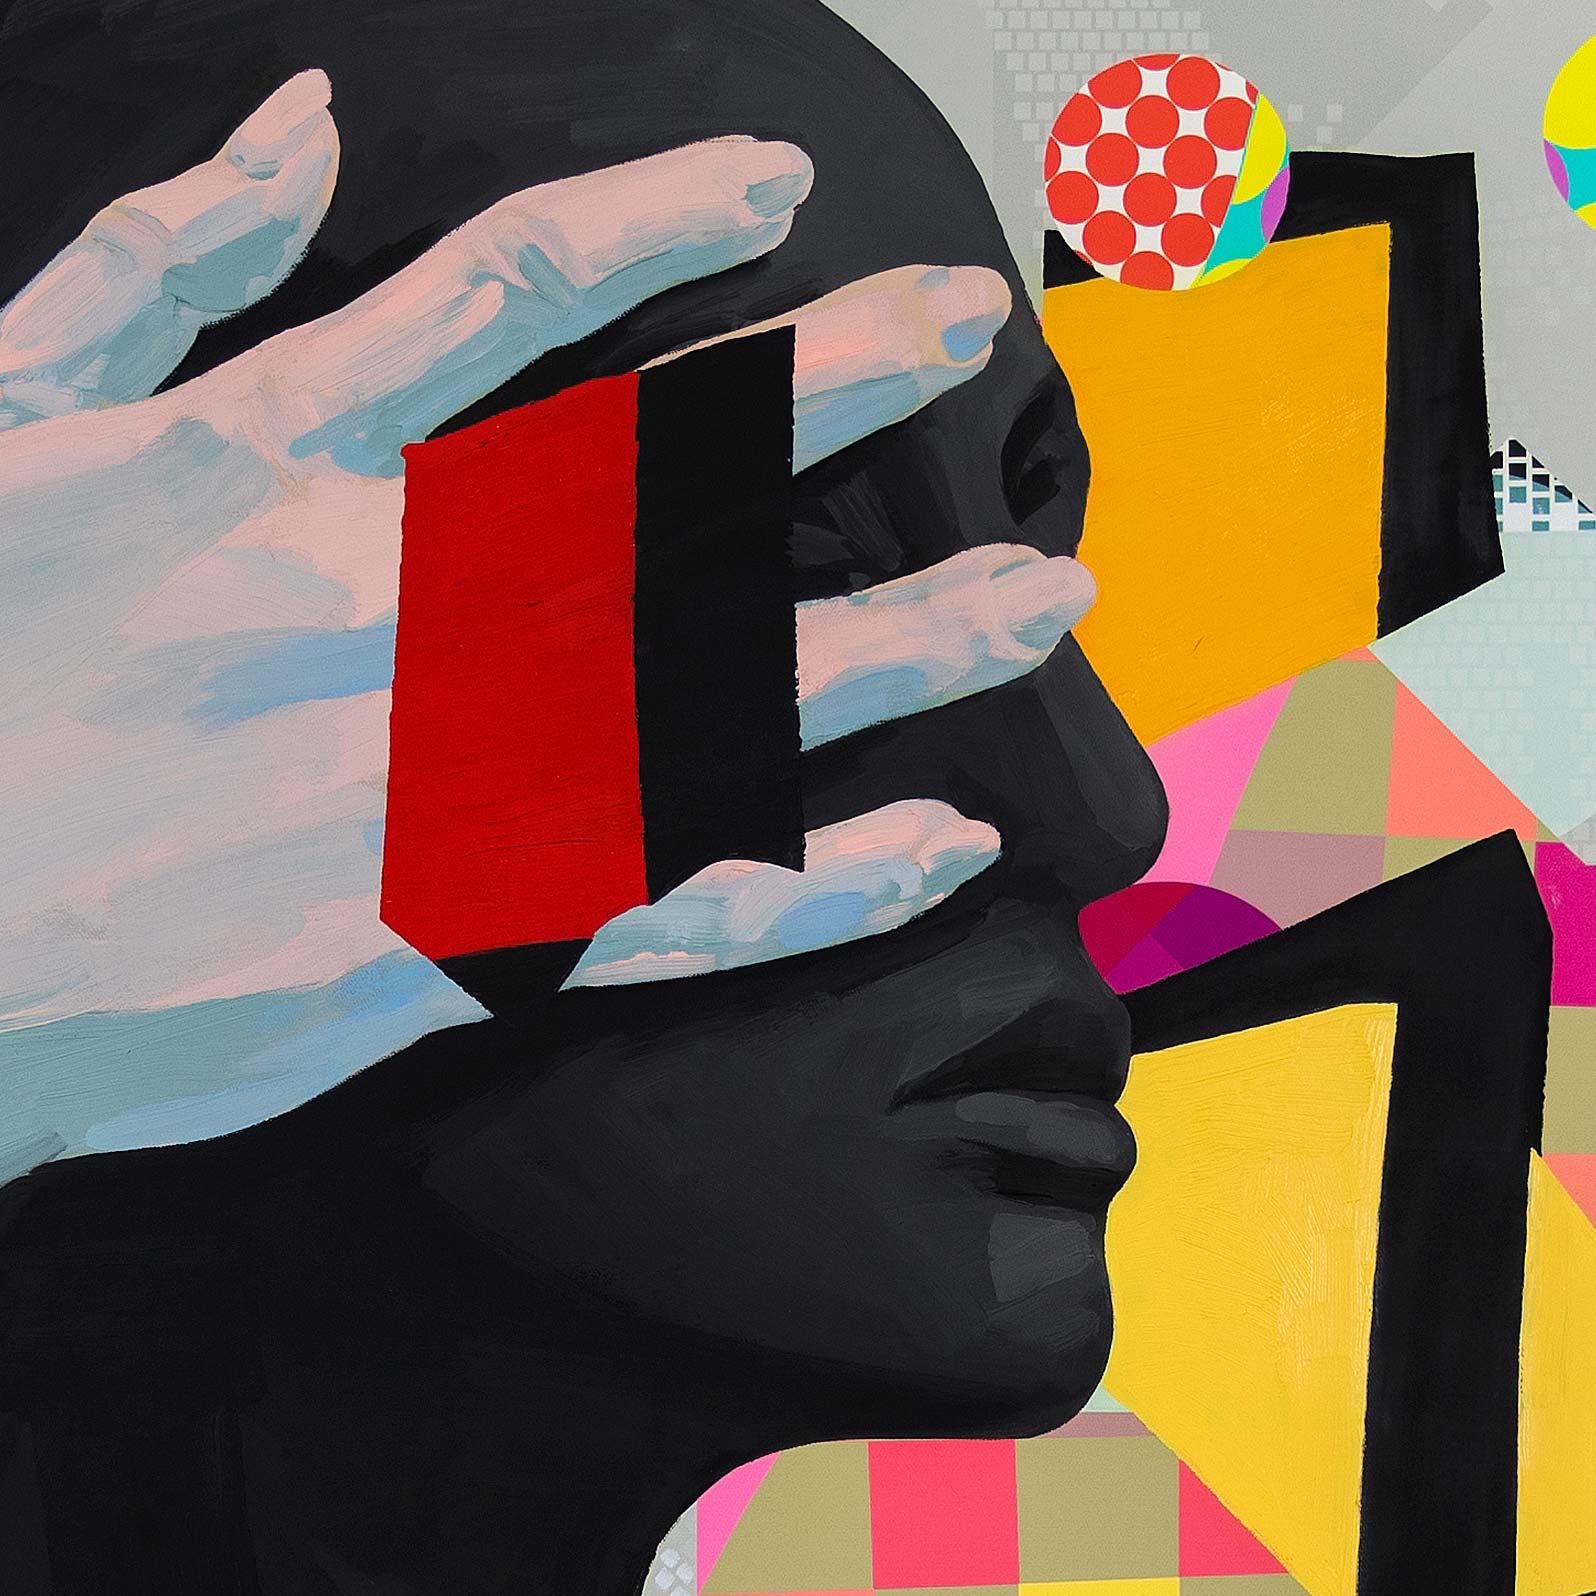 Anca Stefanescu | Contemporary Creative Painter, HiddenGuidance